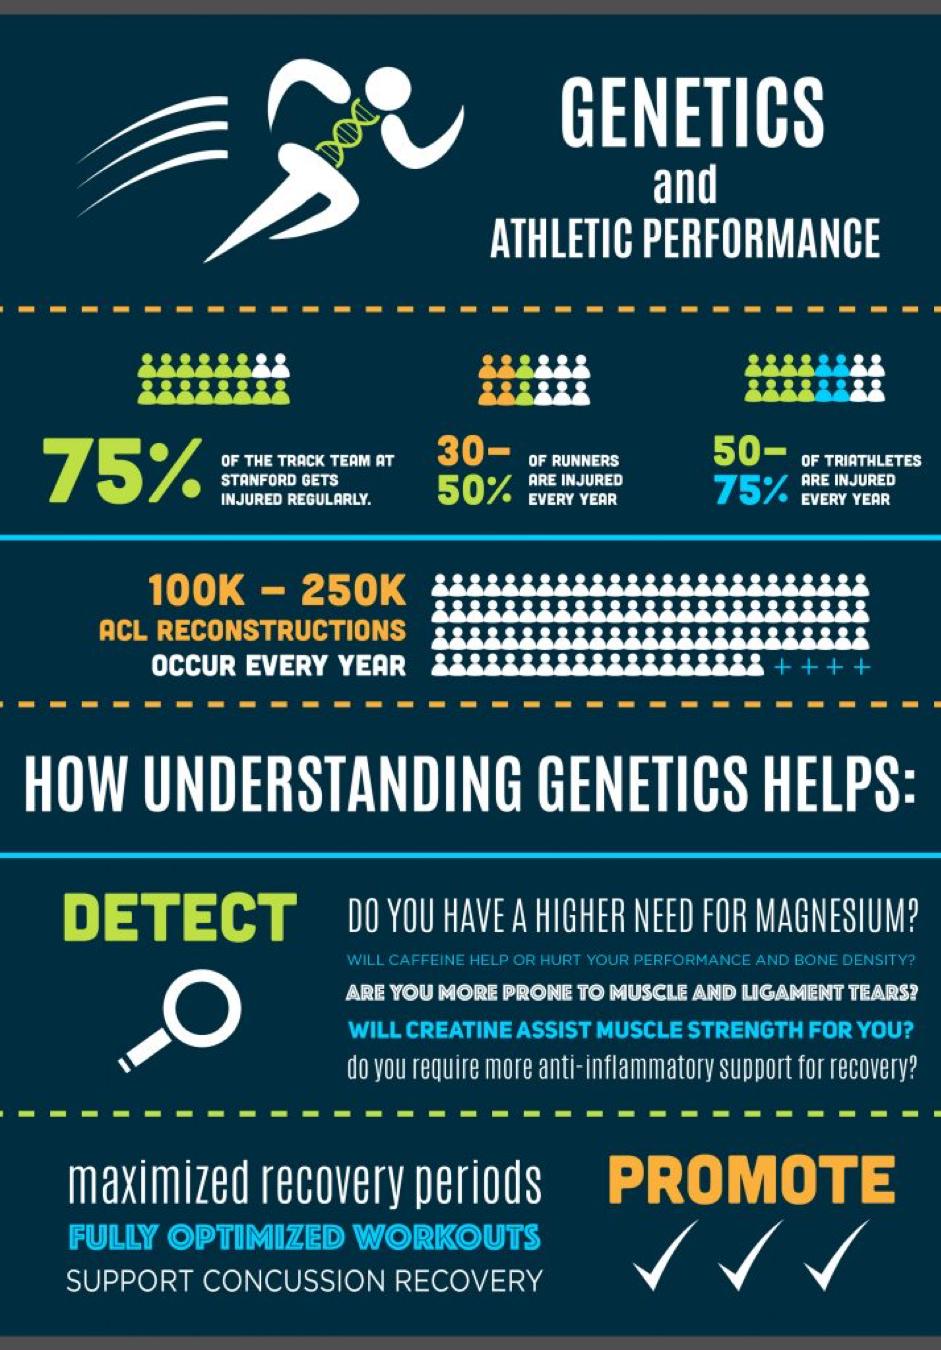 genetics and athletics.png